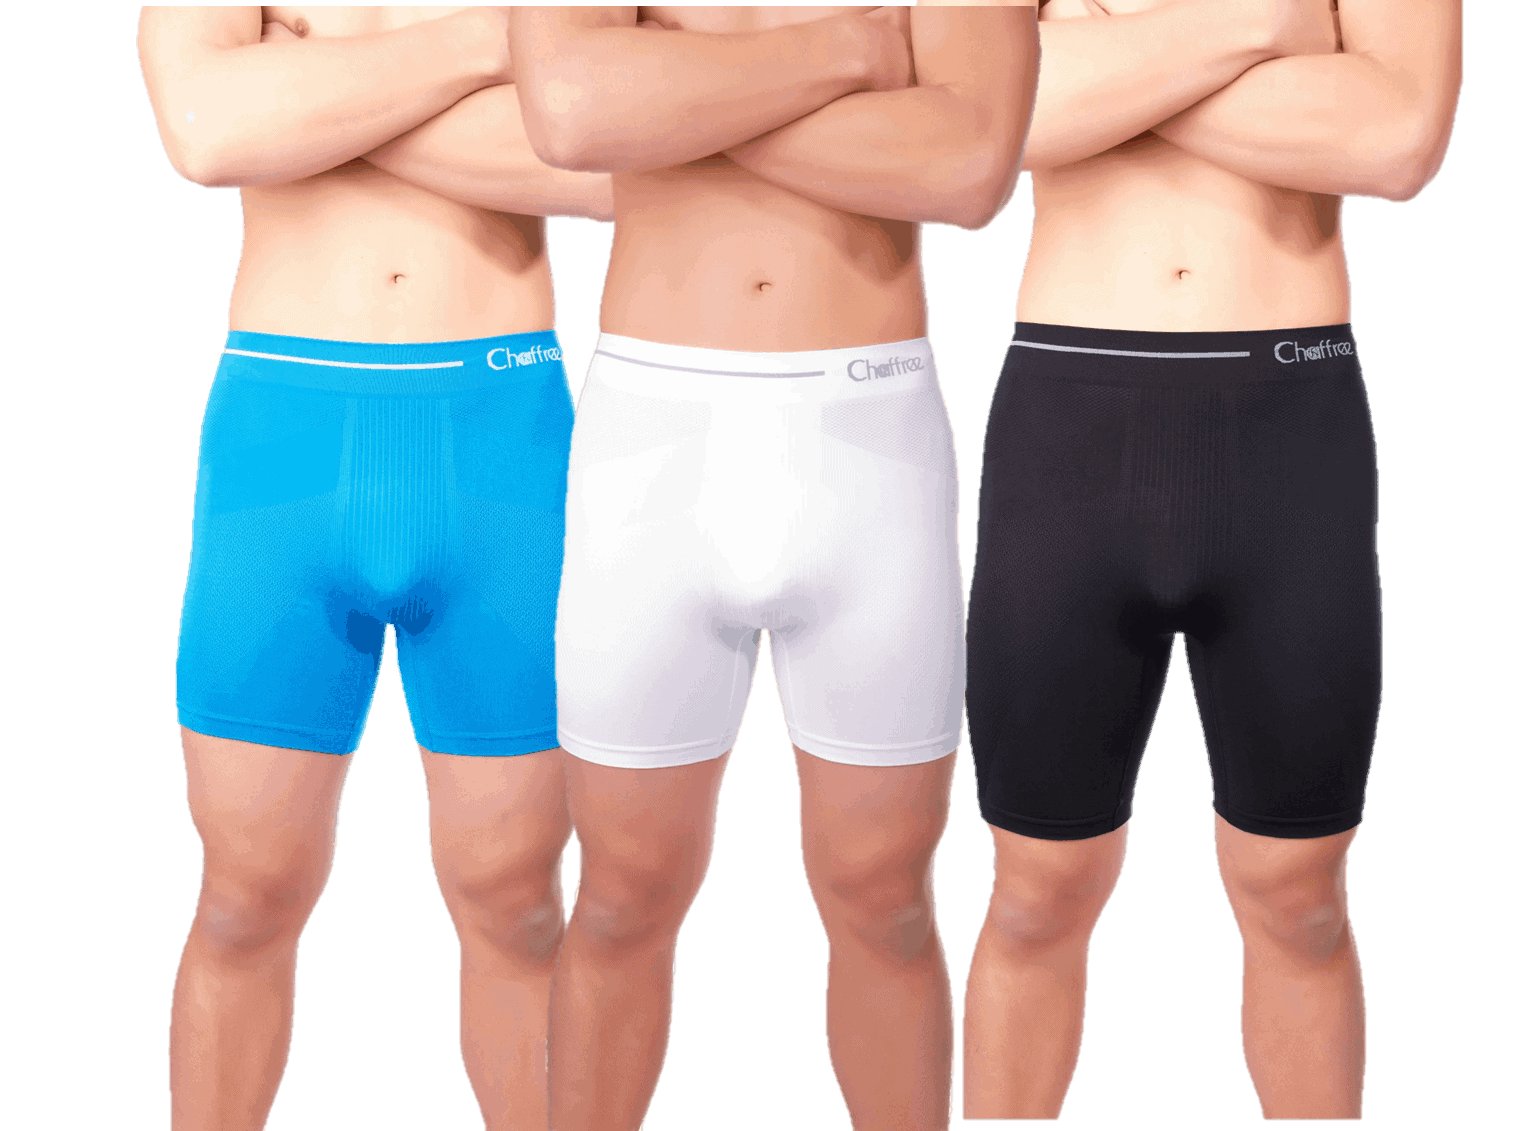 mens boxer shorts,long leg boxer shorts,moisture wicking underwear men,anti chafing underwear,stop chafing underwear